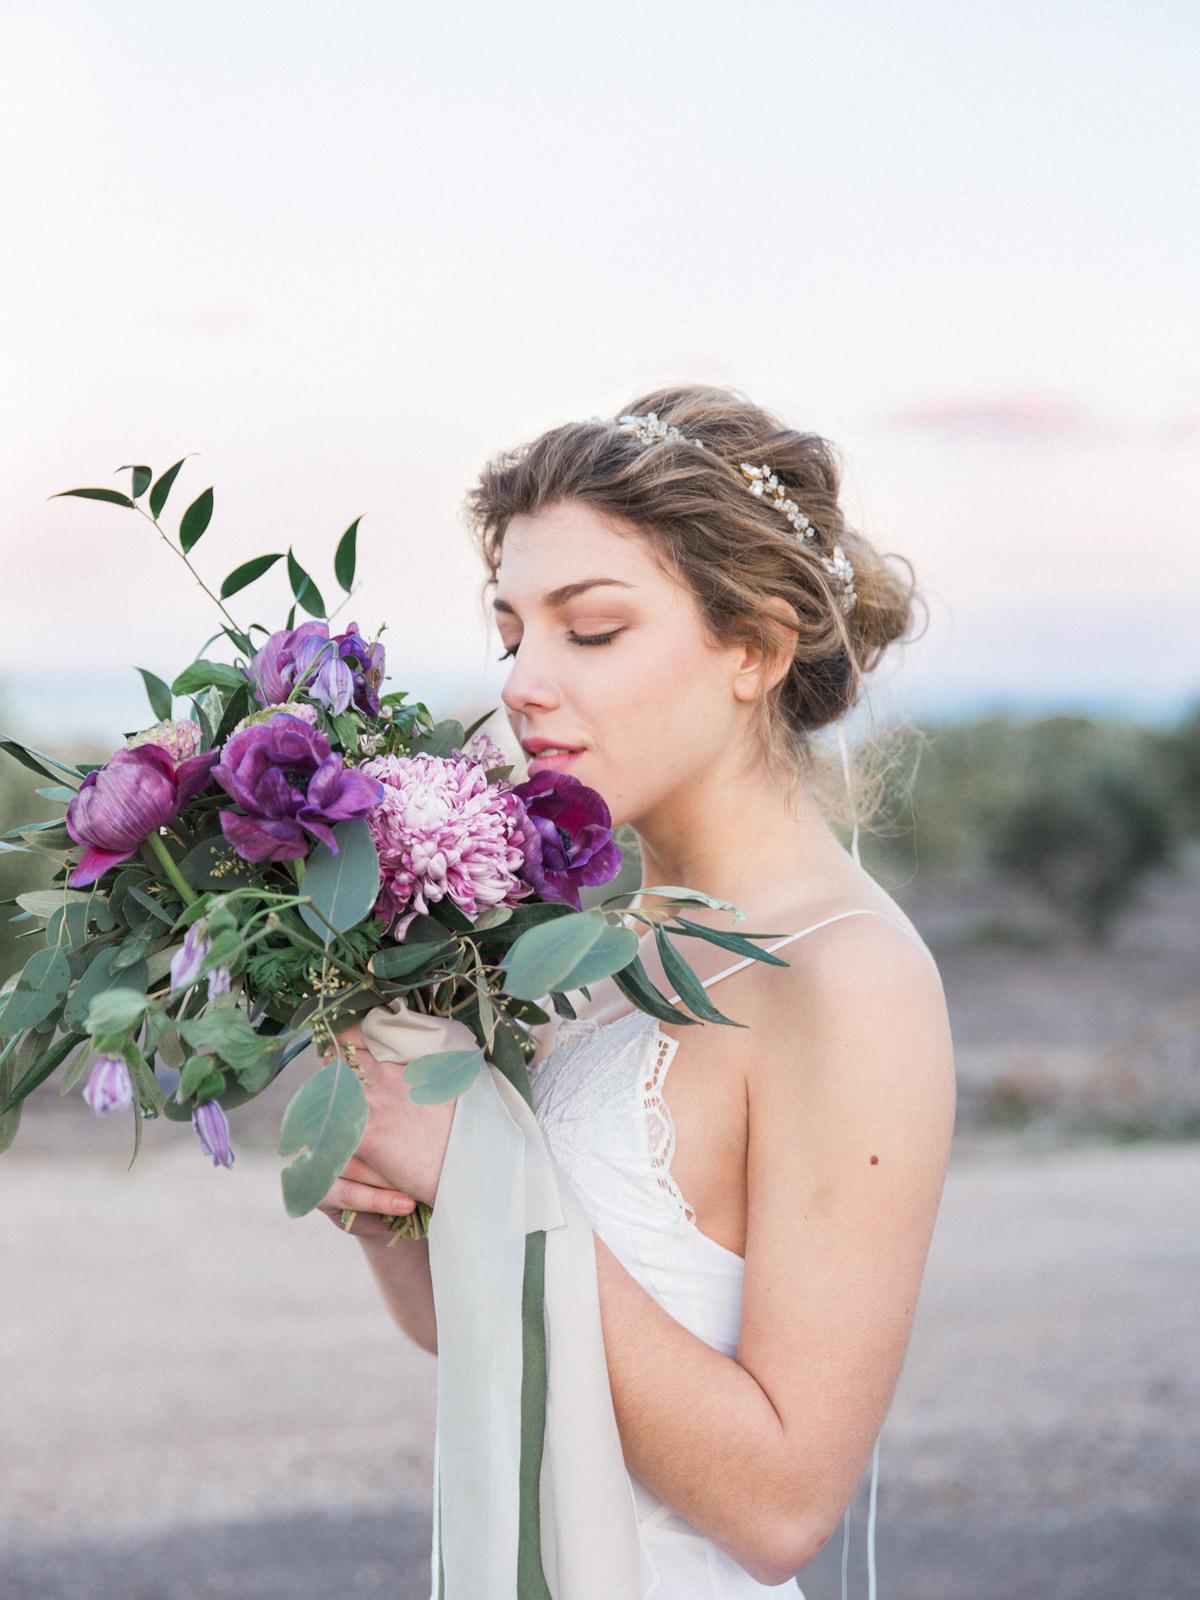 Boho Chic Bohemian Wedding Photographer